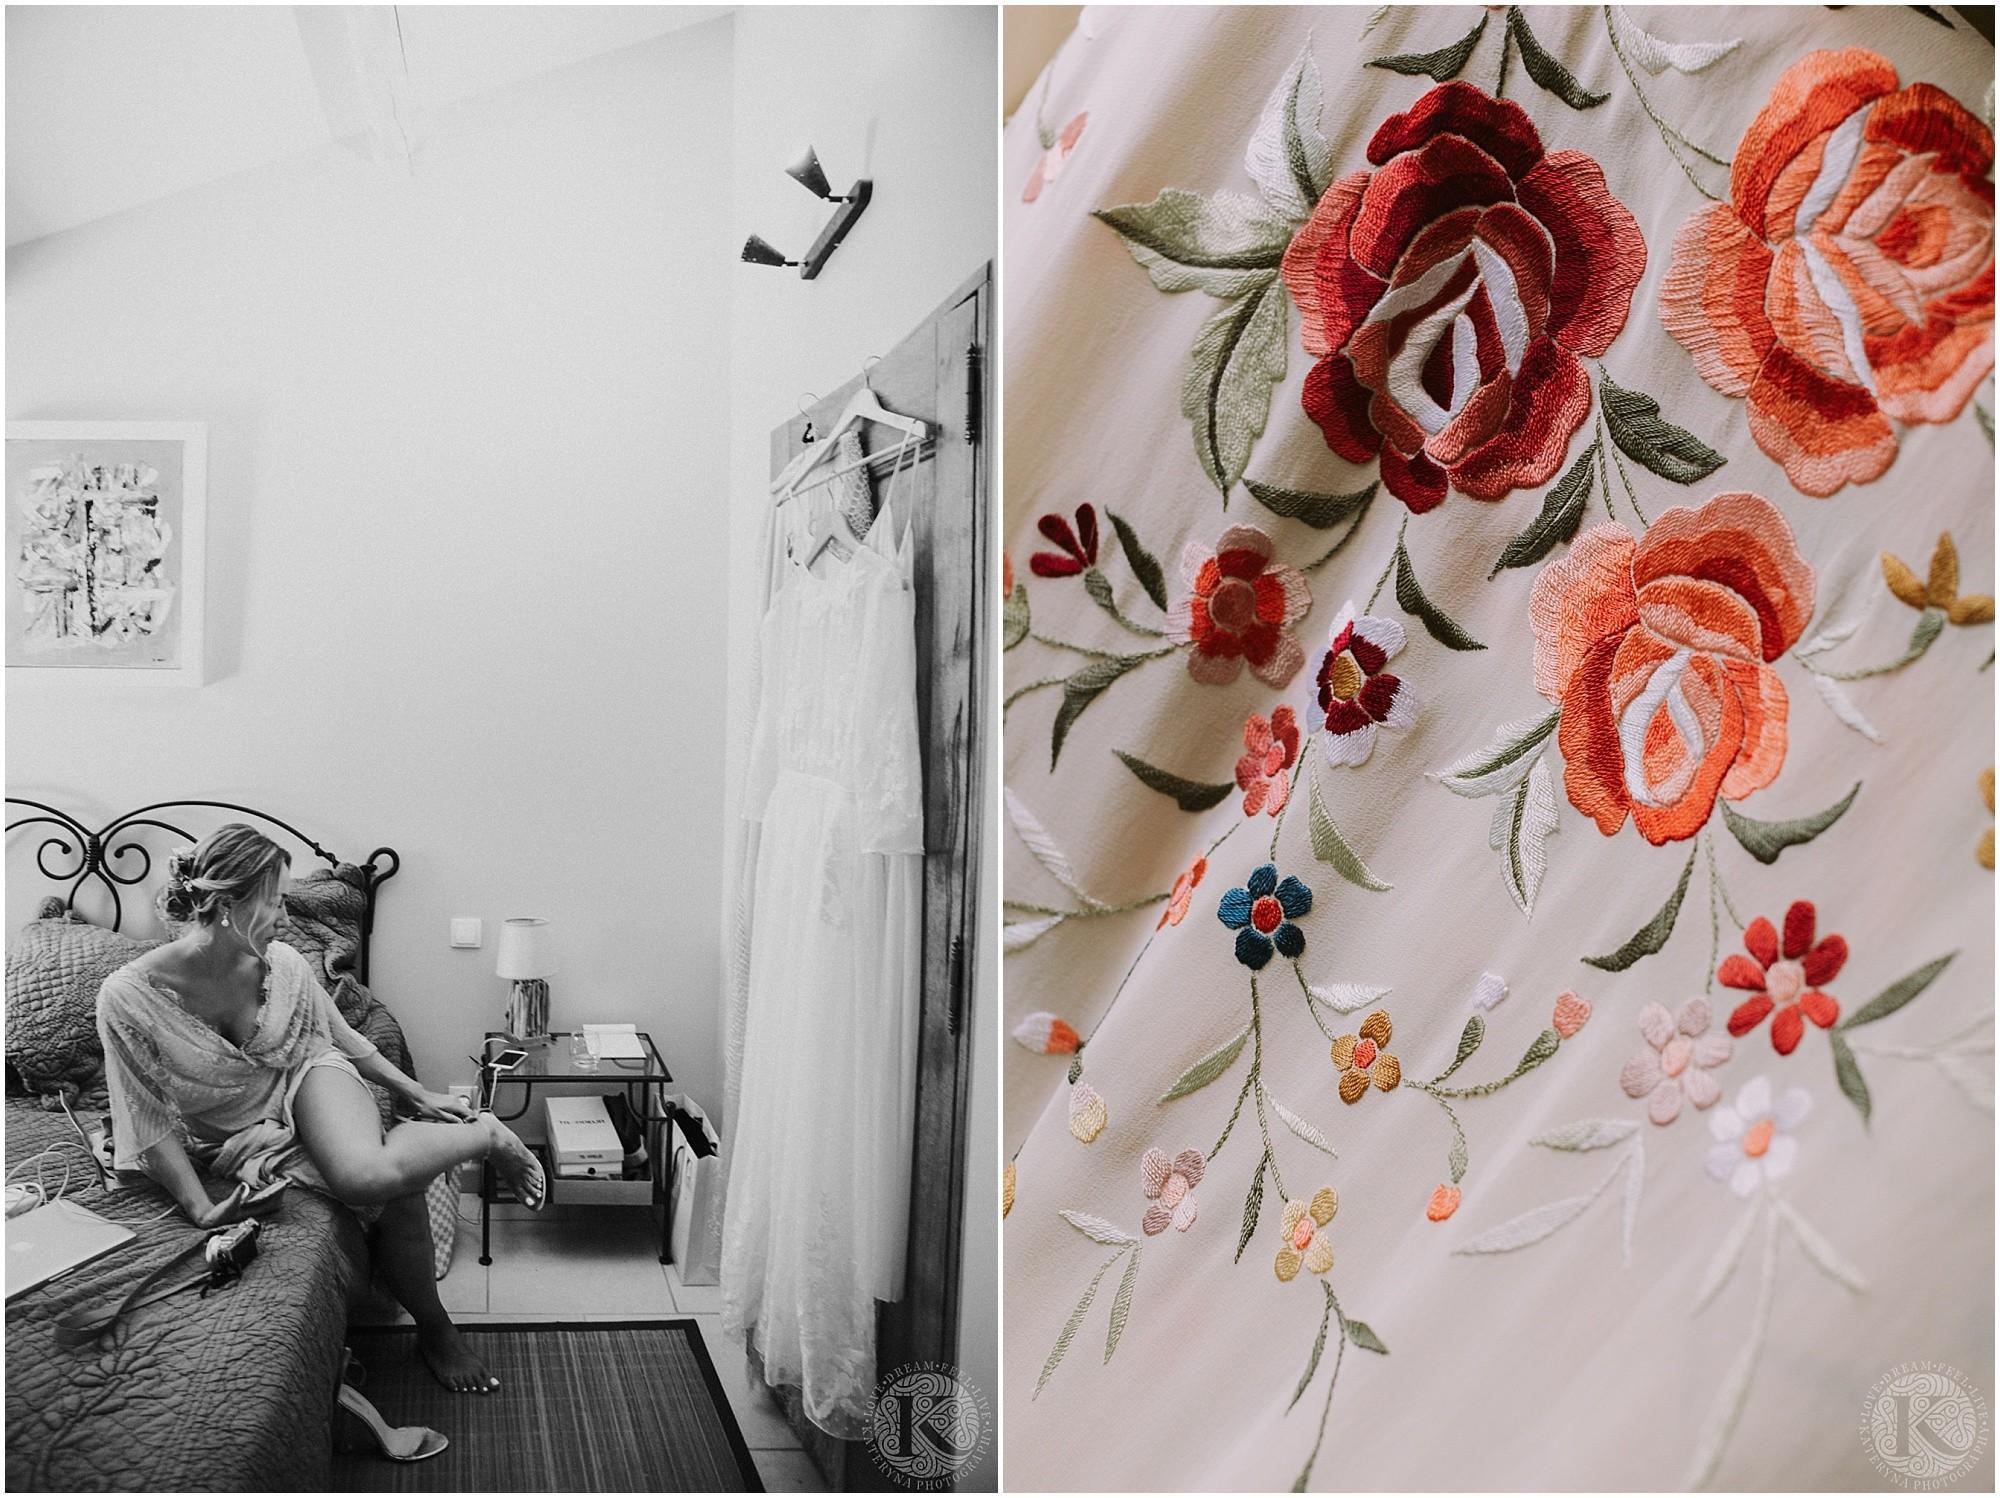 Kateryna-photos-photographe-mariage-vaucluse-provence-avignon-ferme-st-hugues_0016.jpg